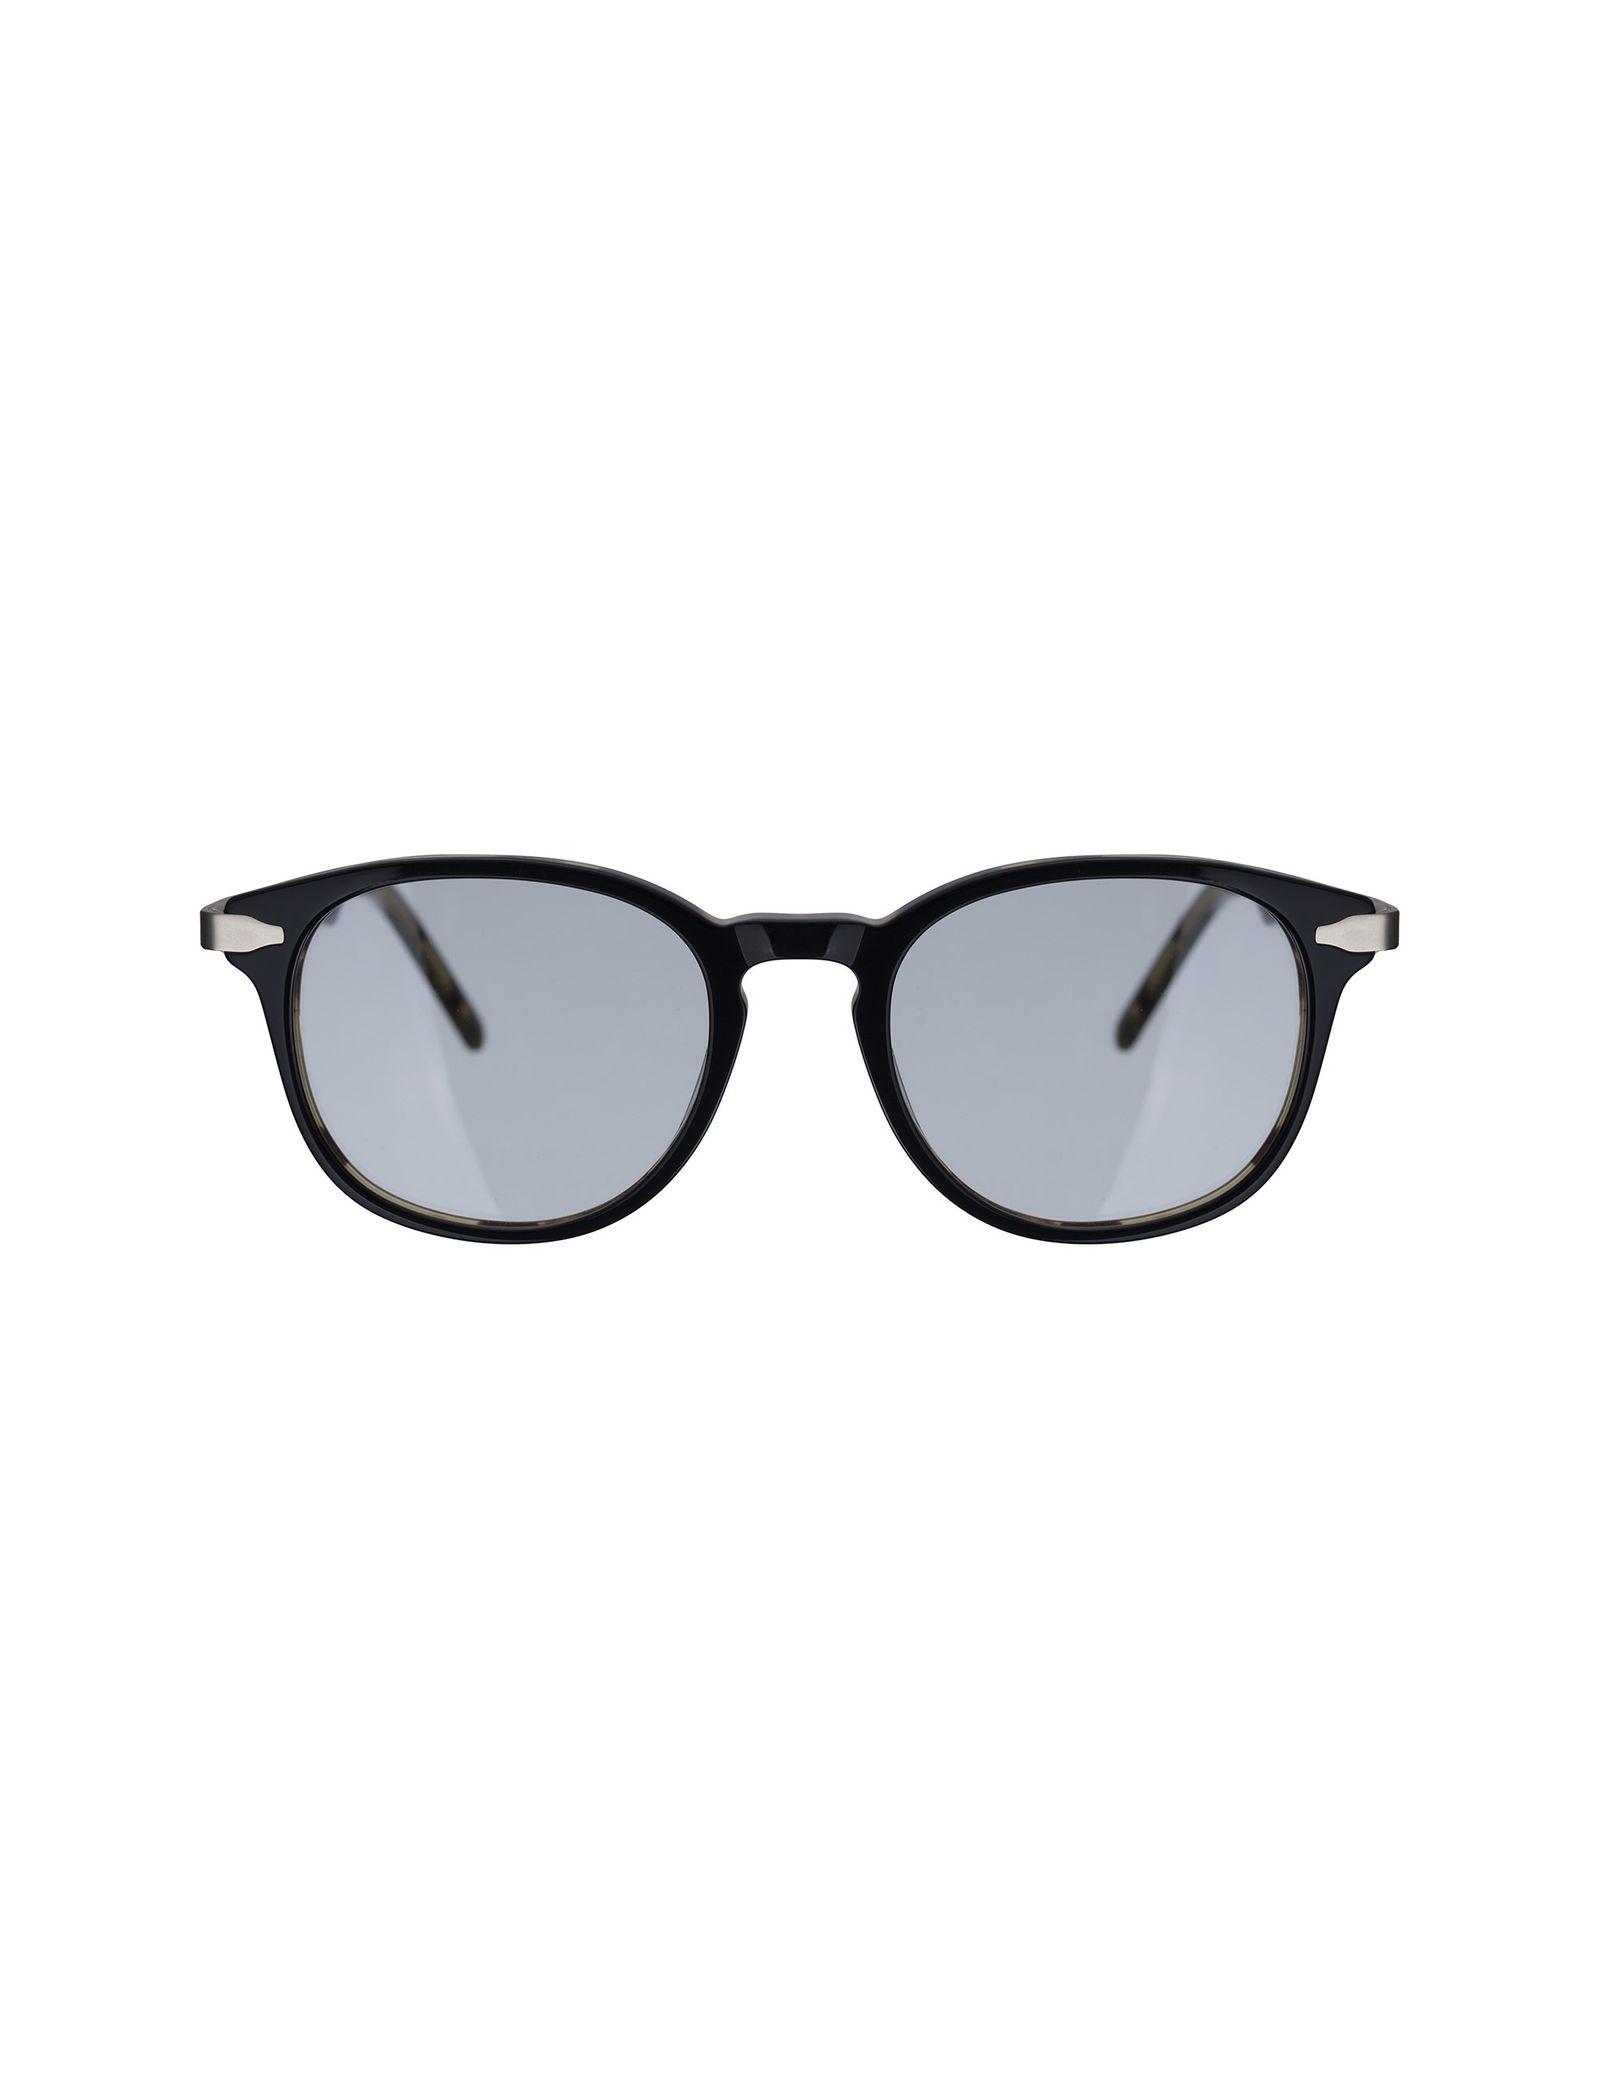 عینک طبی پنتوس مردانه - اسپاین - مشکي  - 1